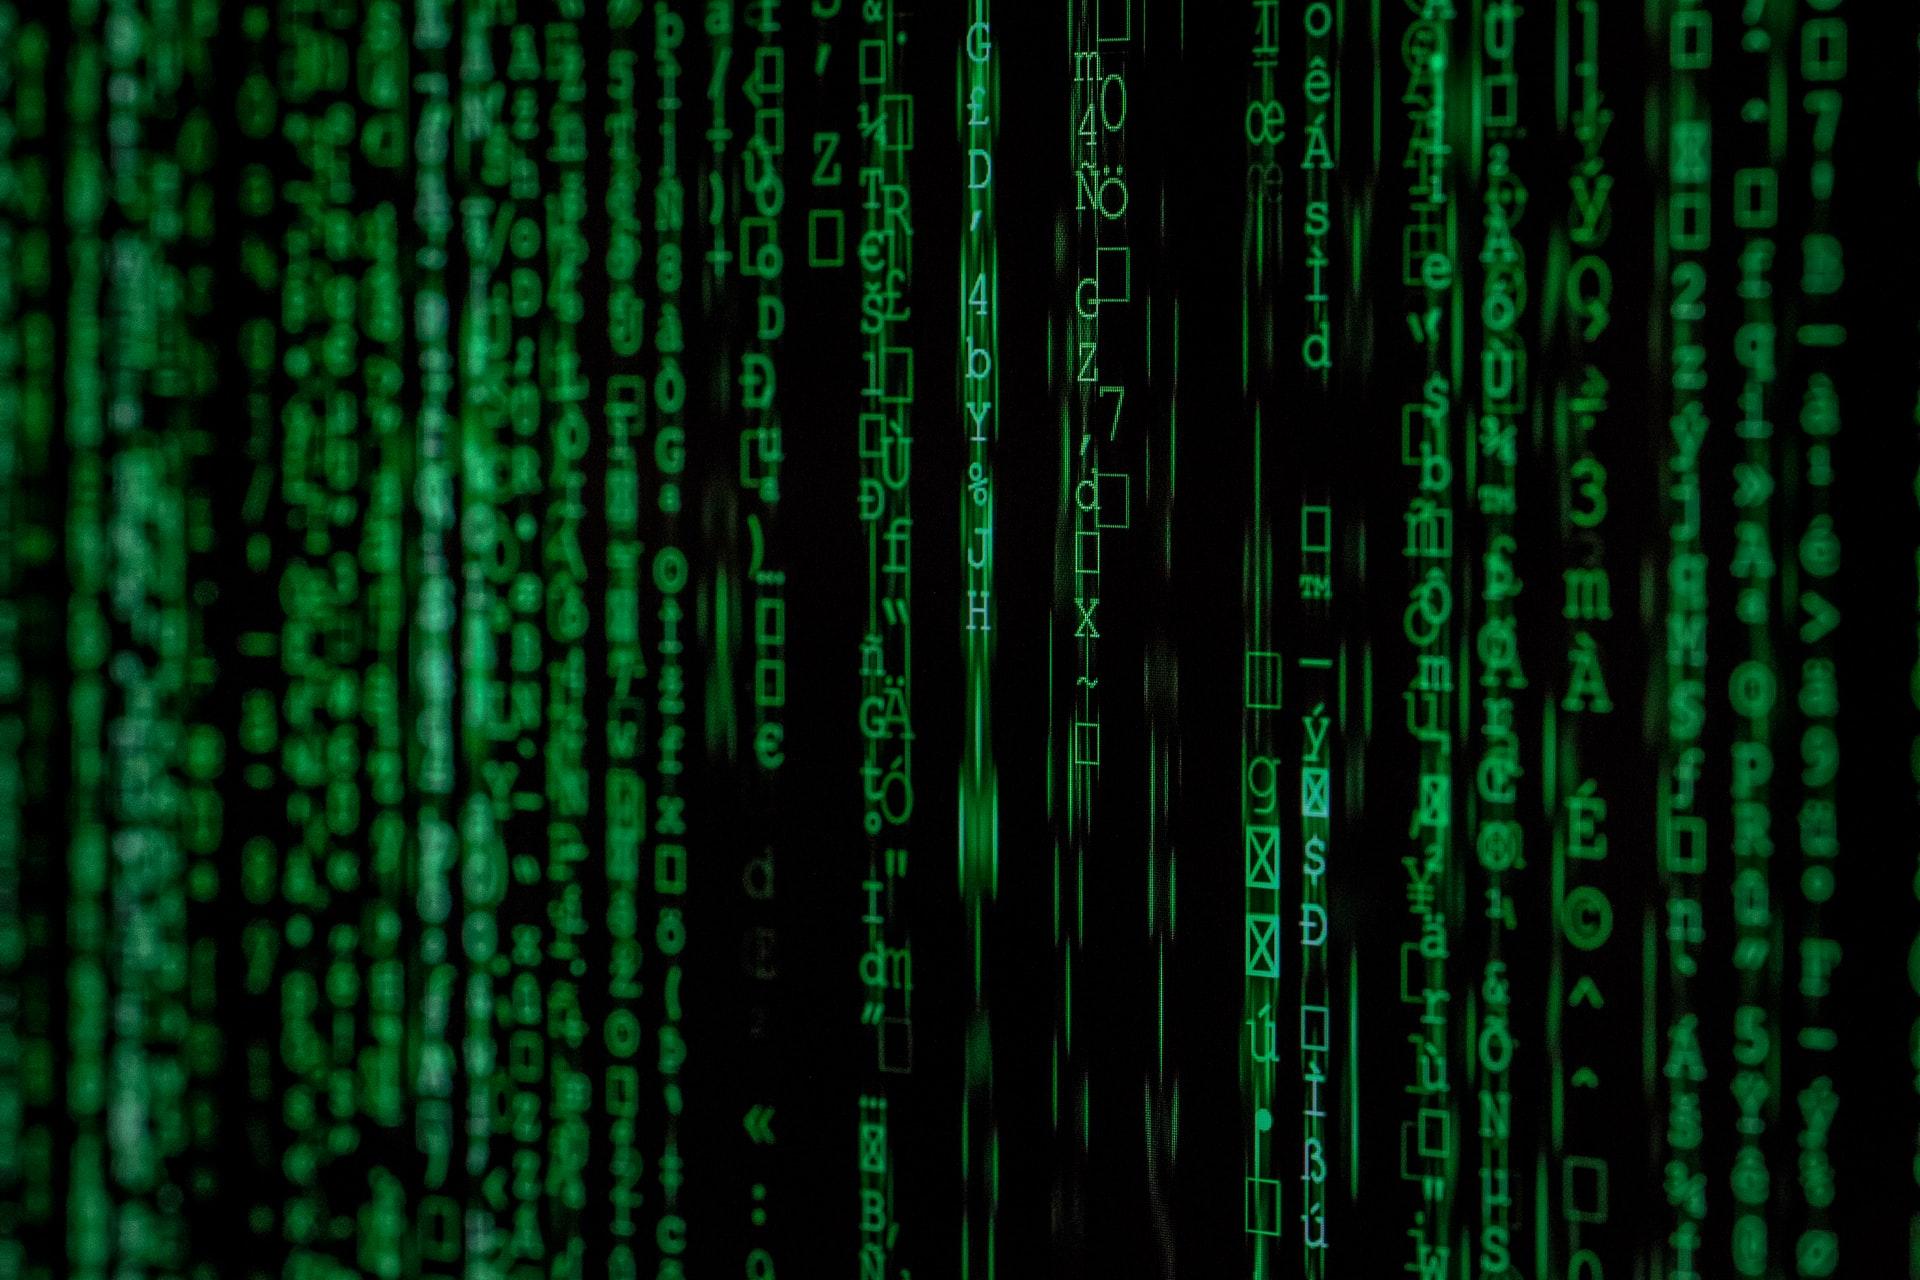 Минтруд утвердил профстандарты анализа цифрового следа